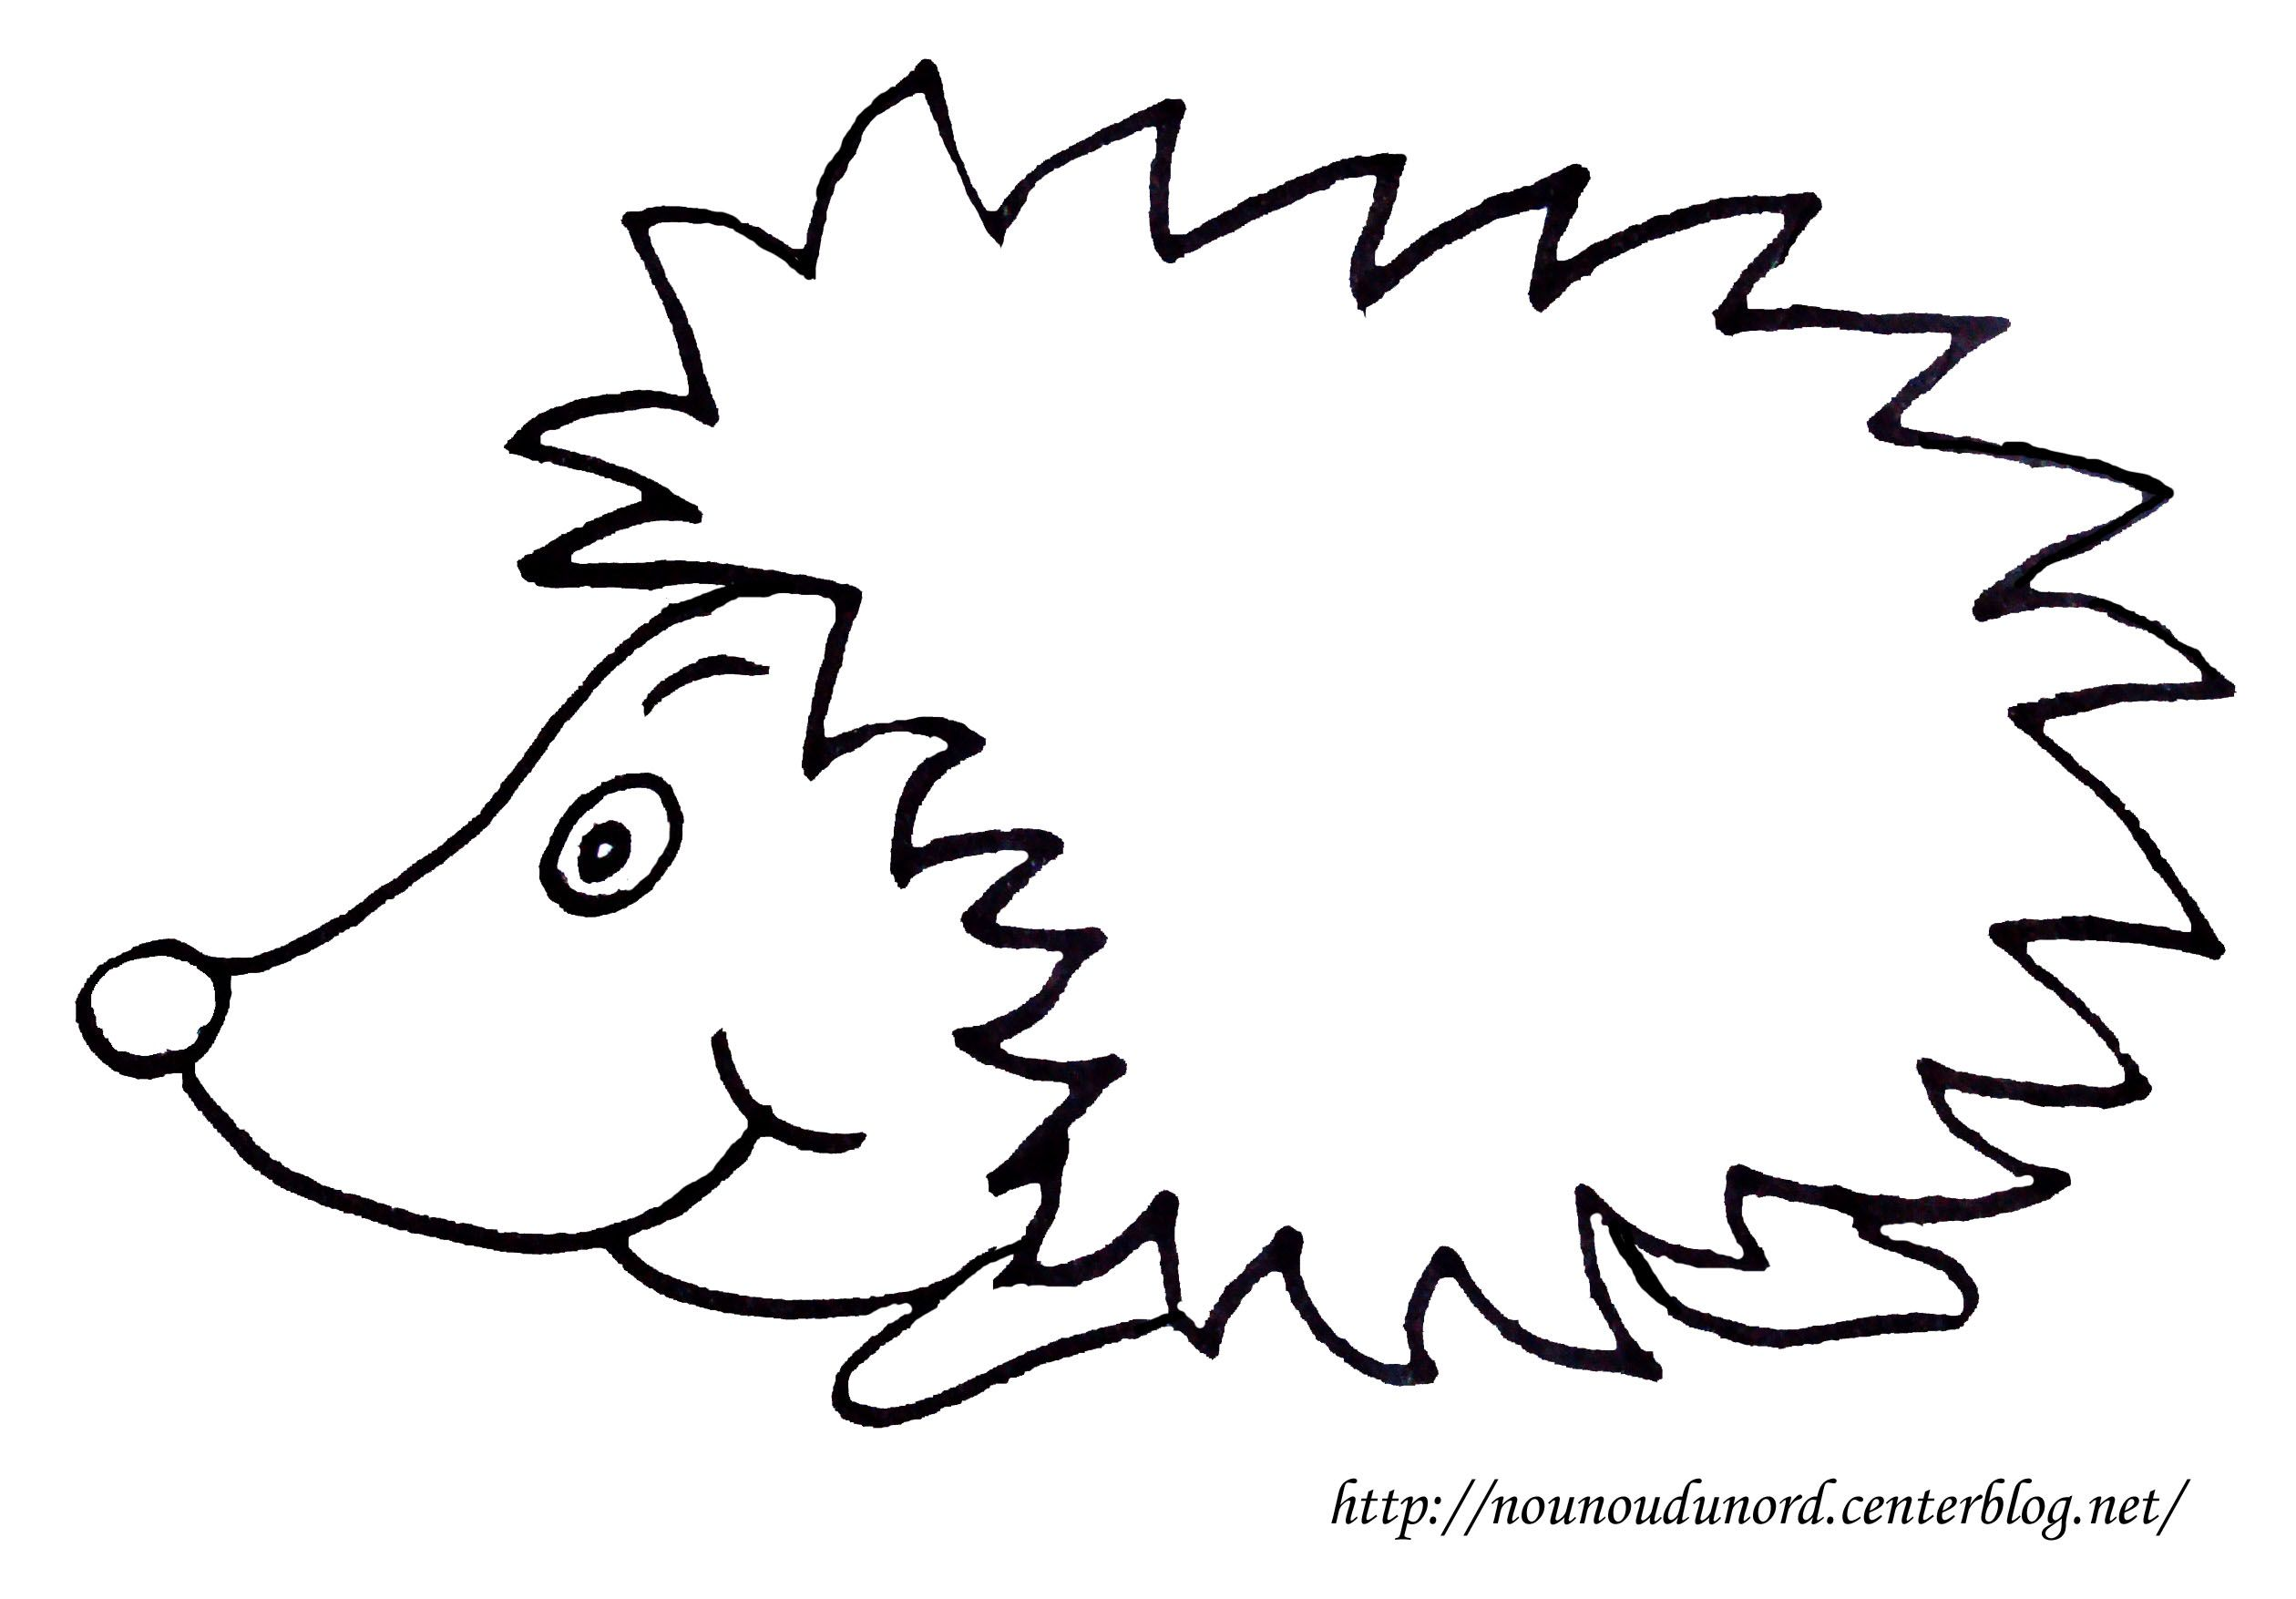 Coloriage h risson dessin par nounoudunord - Herisson coloriage ...